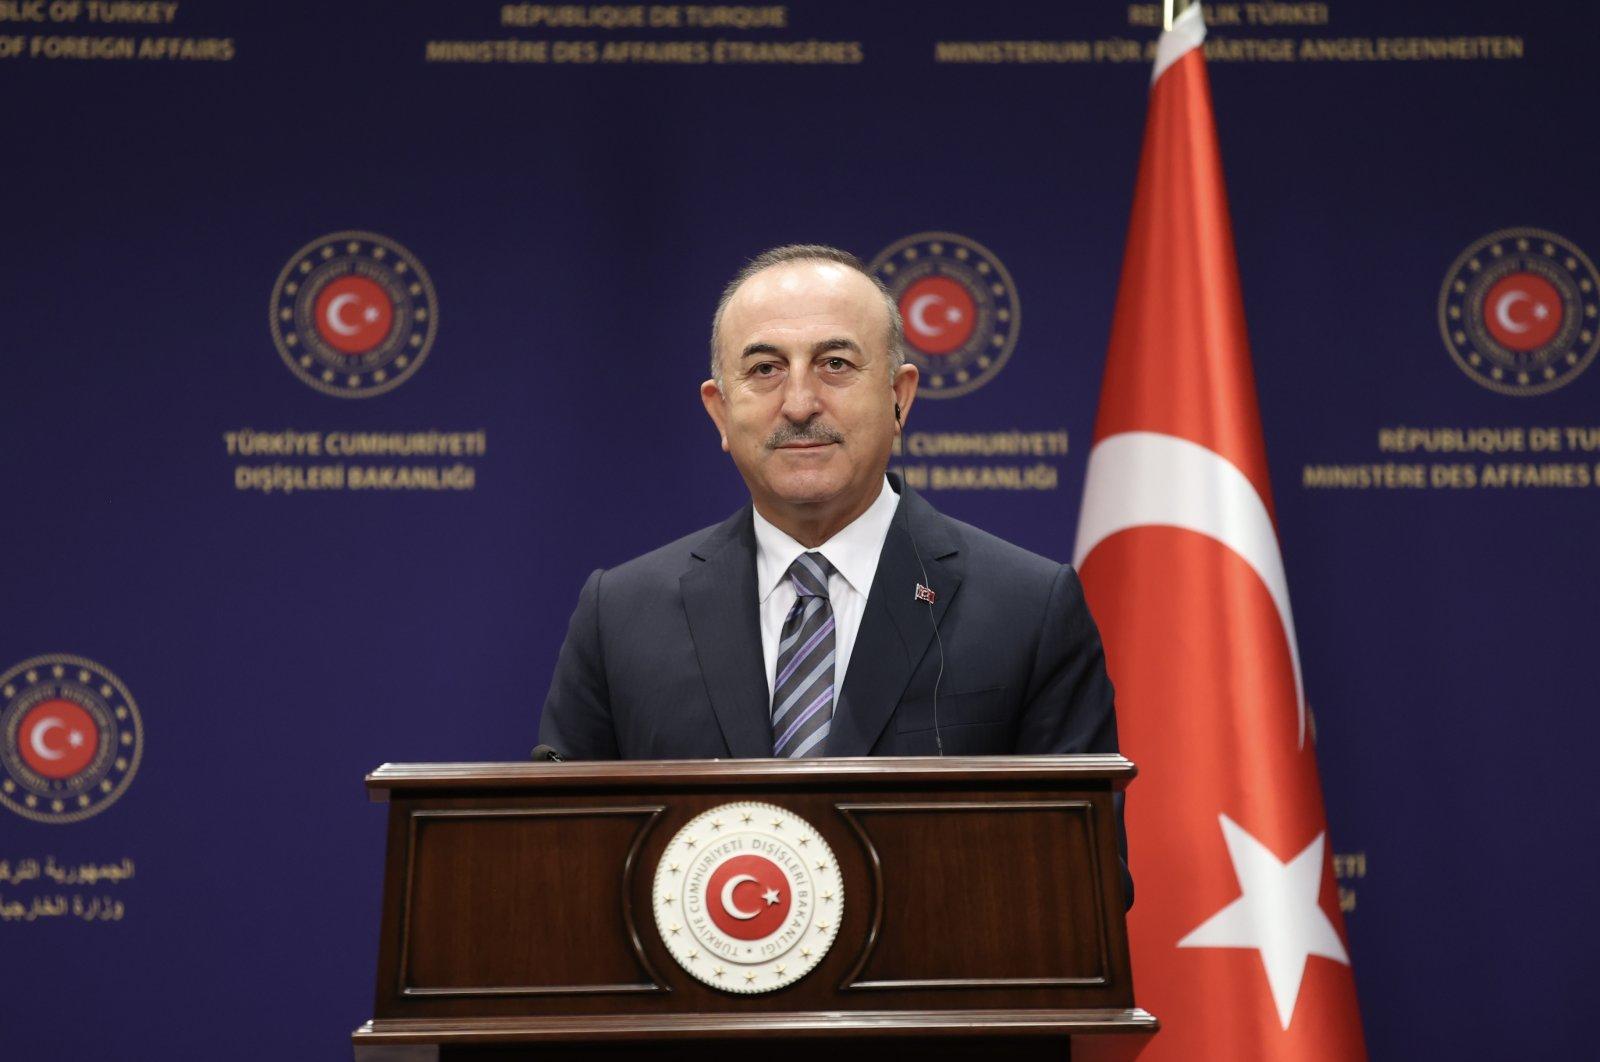 US, Russia bear responsibility in recent YPG attacks: FM Çavuşoğlu